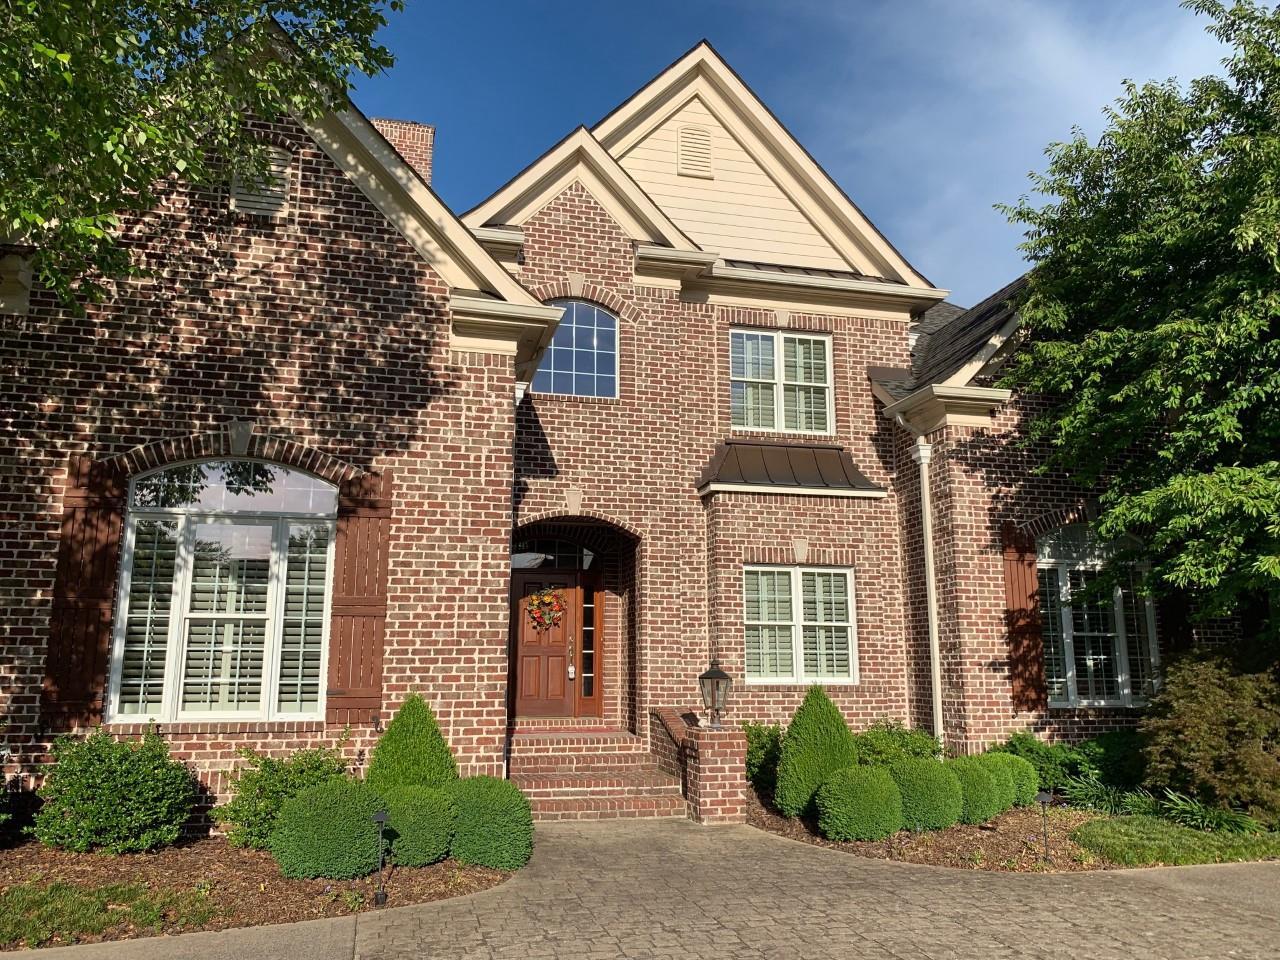 1462 Avellino Cir, Murfreesboro, TN 37130 - Murfreesboro, TN real estate listing